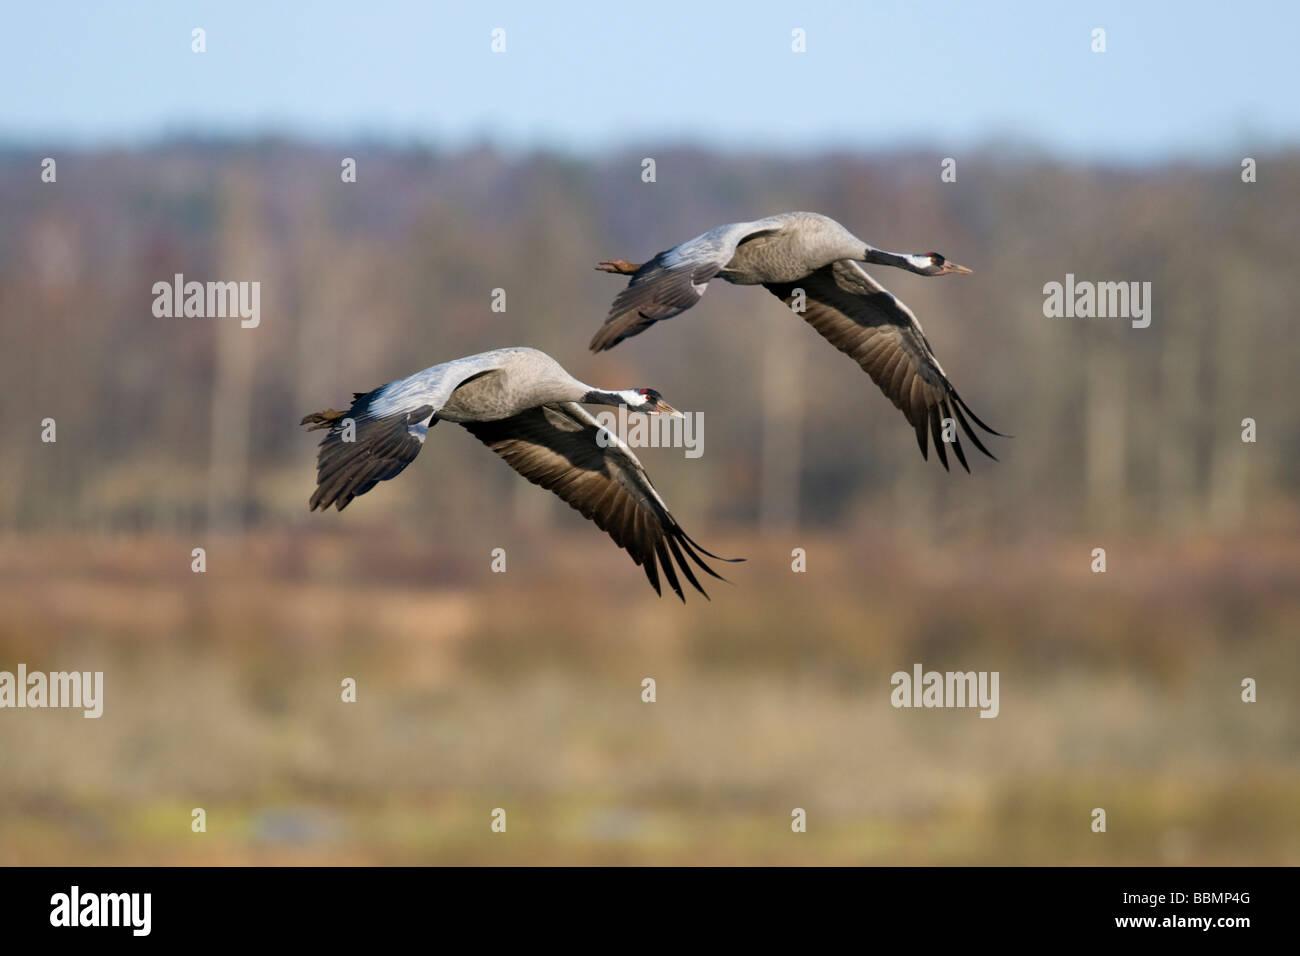 Common Cranes (Grus grus) flying in pairs in the countryside, Lake Hornborga, Vaestergoetland, Sweden, Scandinavia, Stock Photo